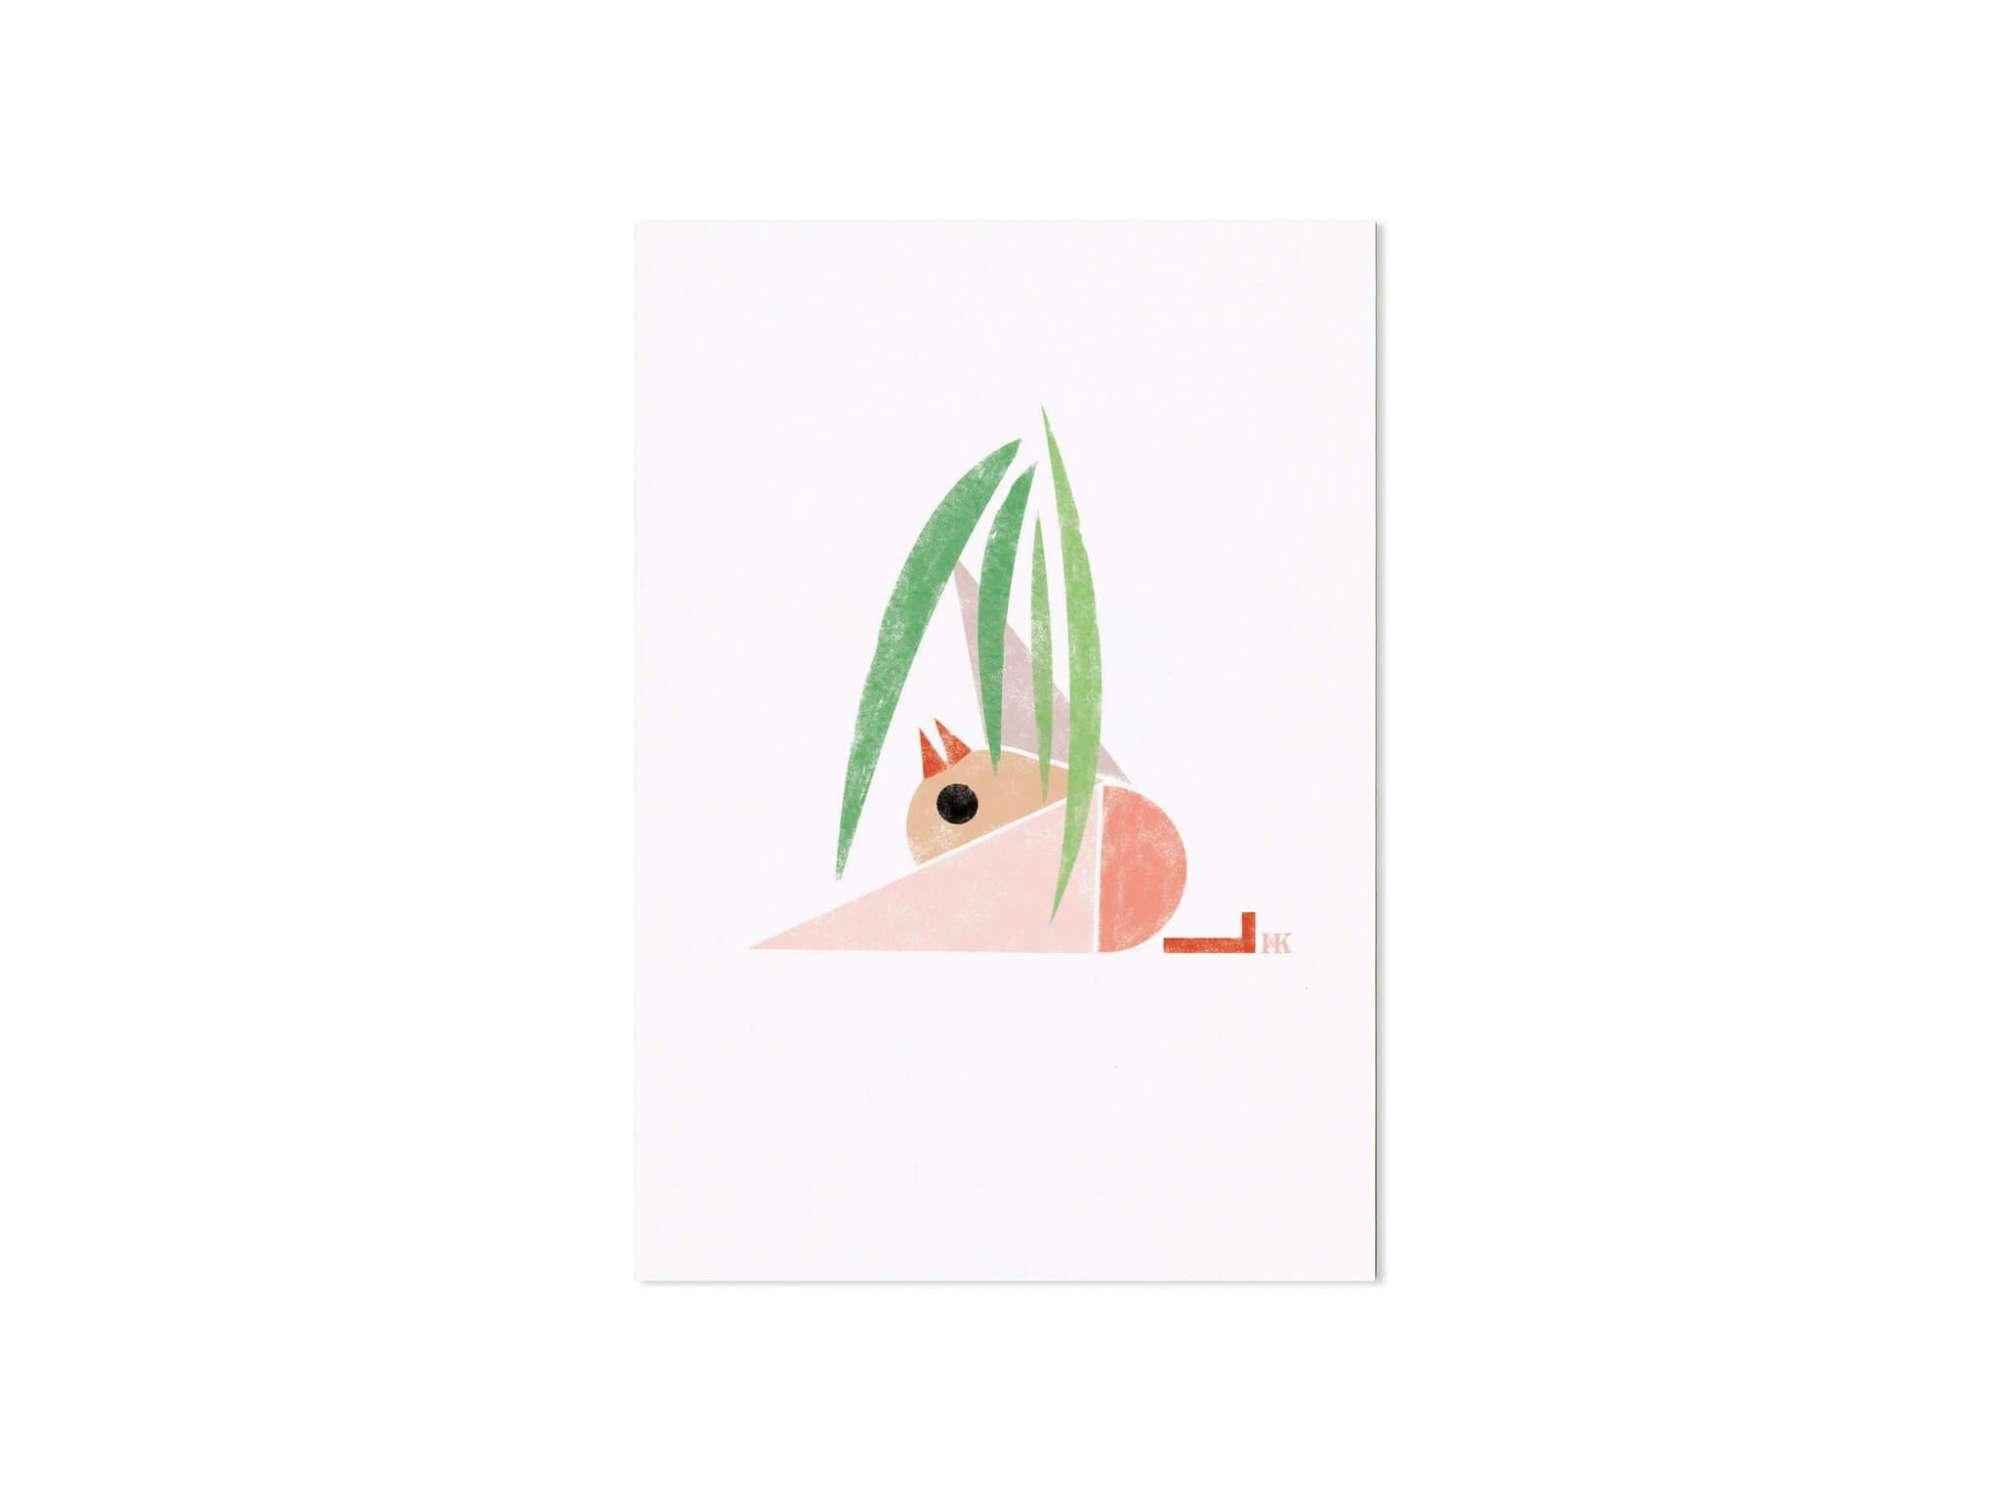 carte postale illustrée d'un petit oiseau relax, design Ich&Kar